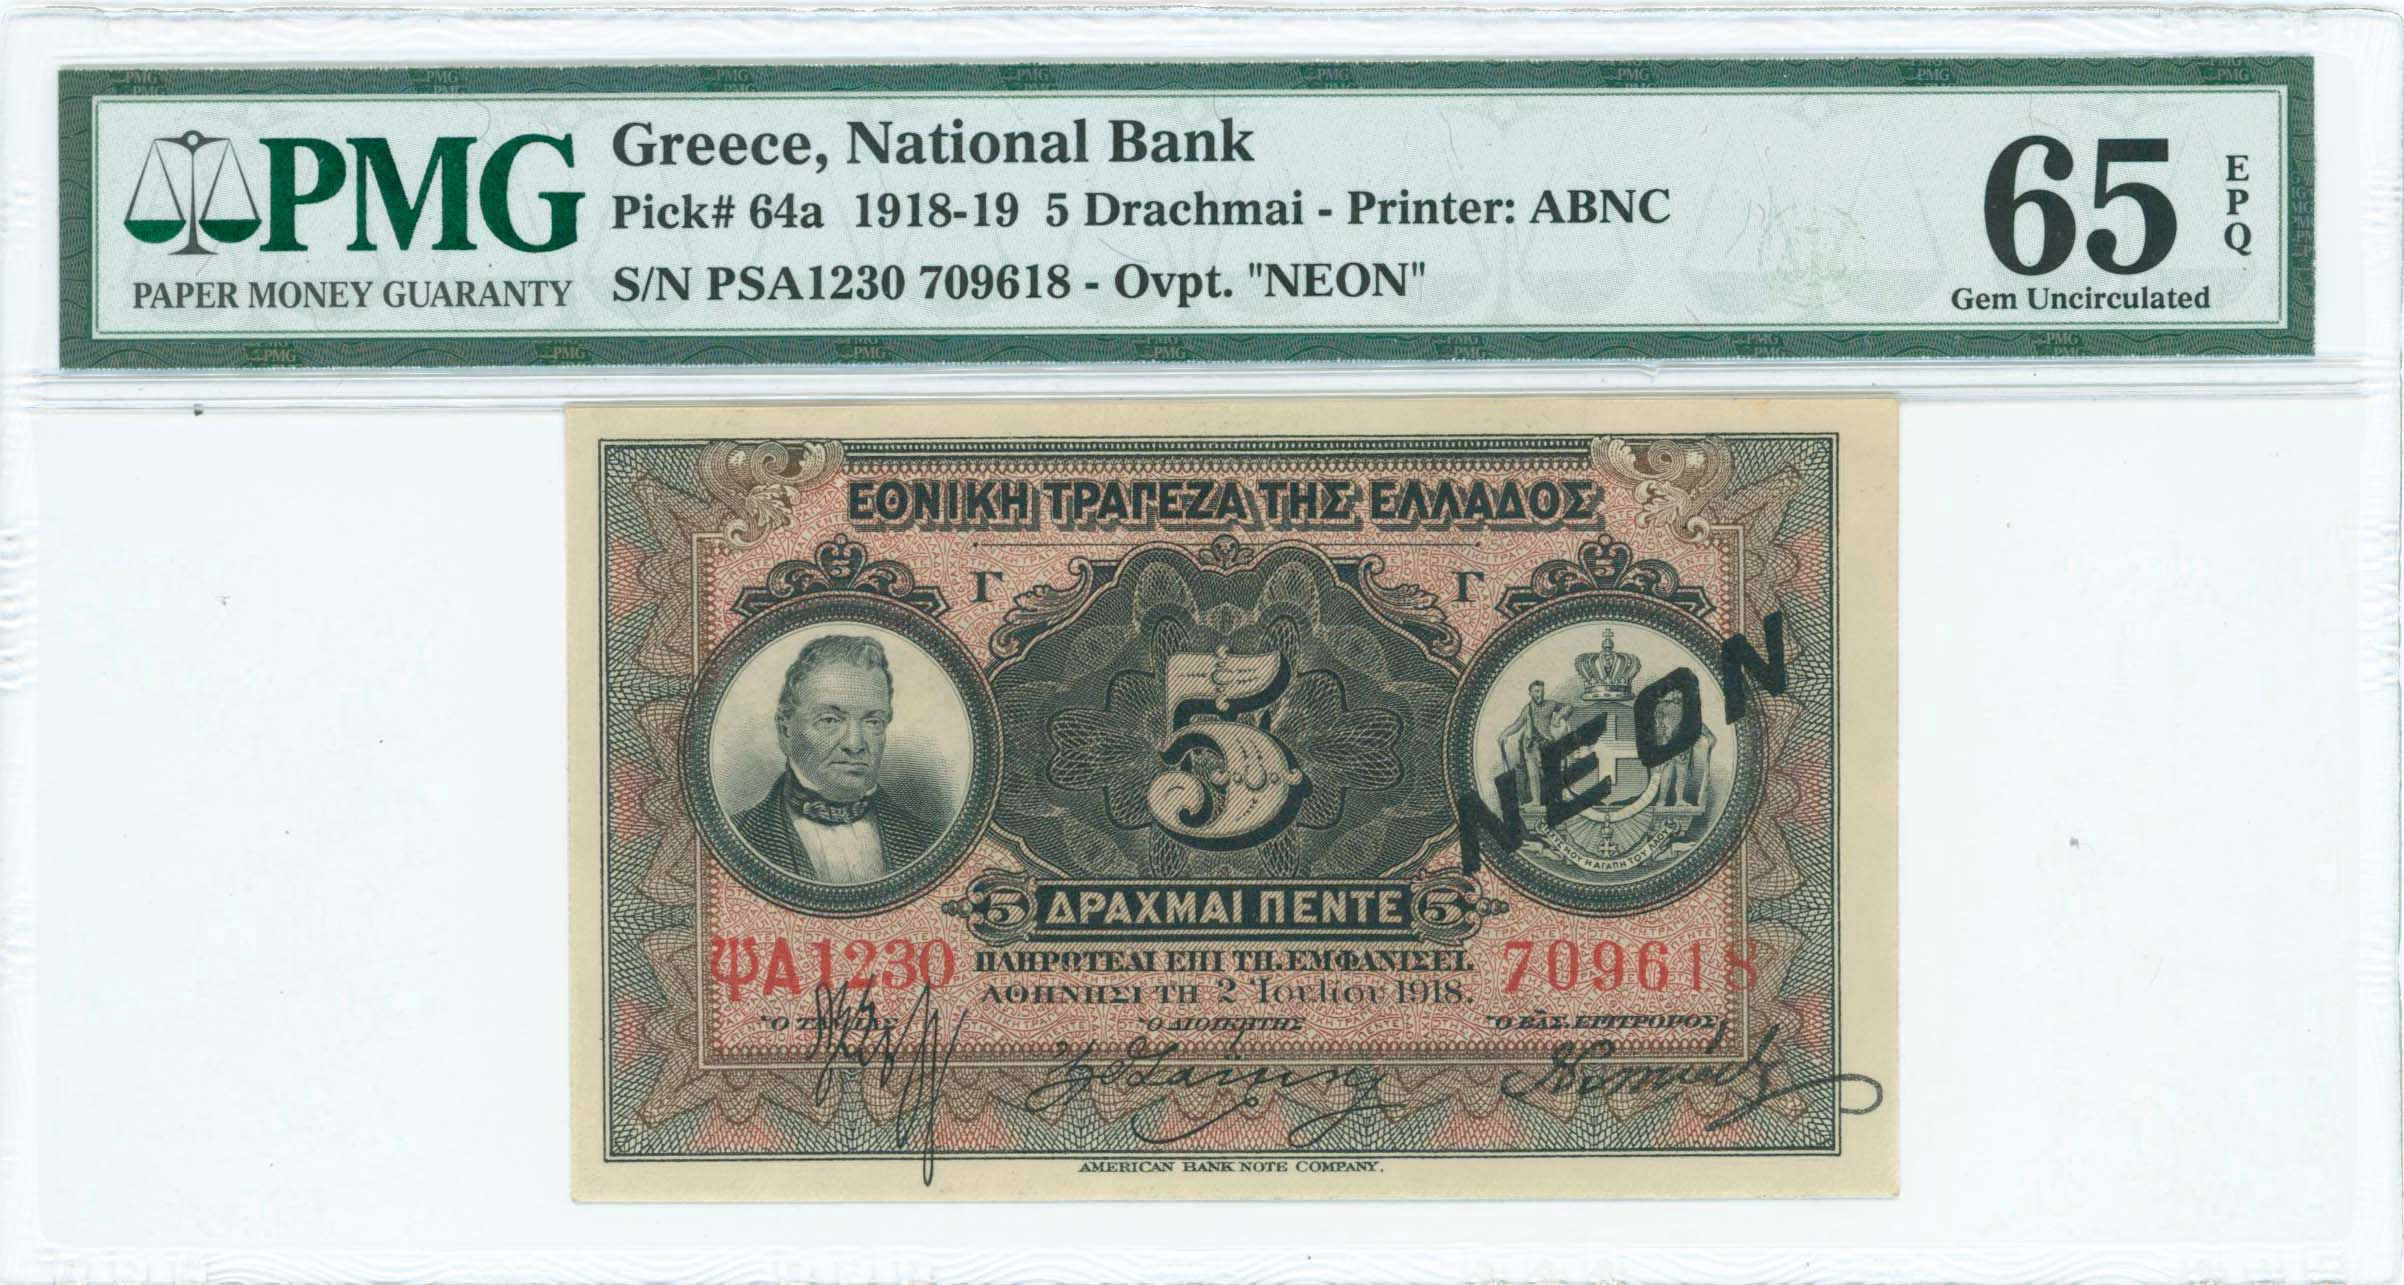 Lot 6402 - -  PAPER MONEY - BANKNOTES National Bank of Greece -  A. Karamitsos Public & Live Internet Auction 671 (Part A)